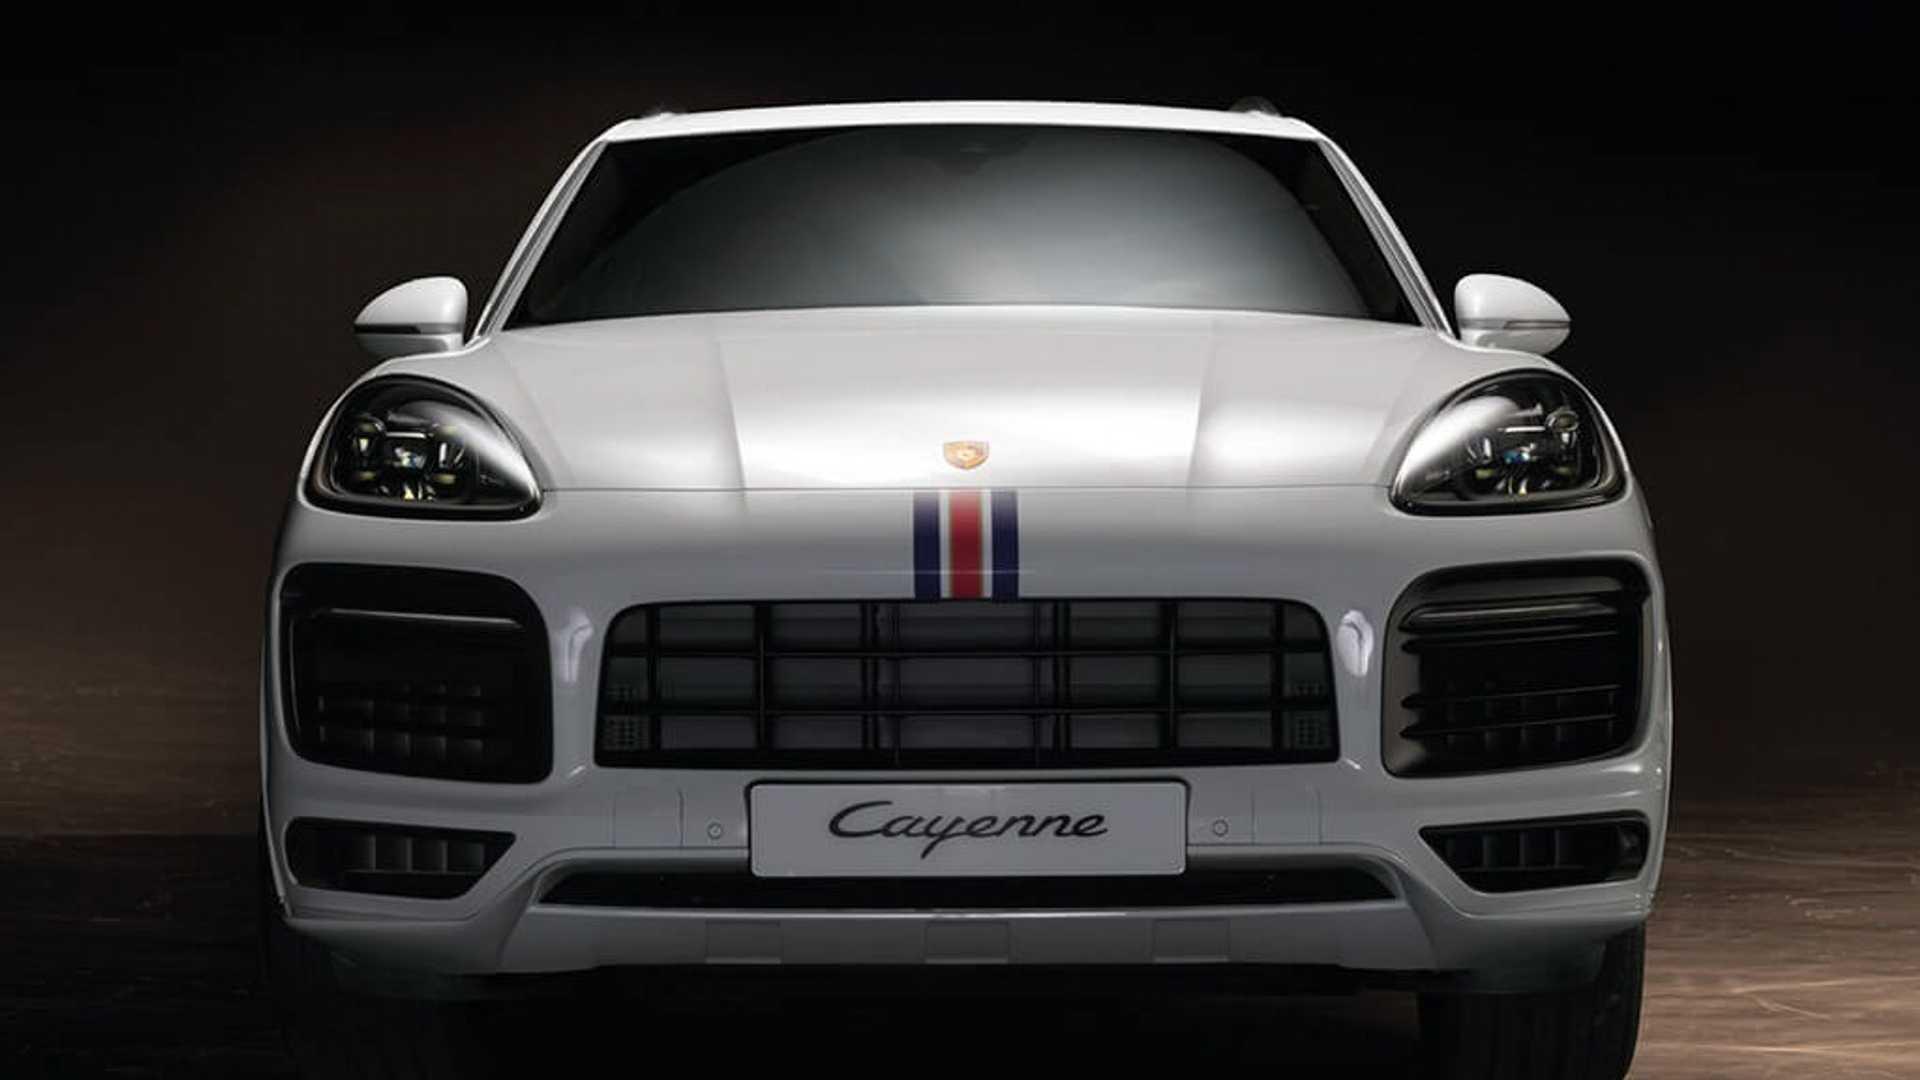 Porsche Cayenne Dakar 84 04